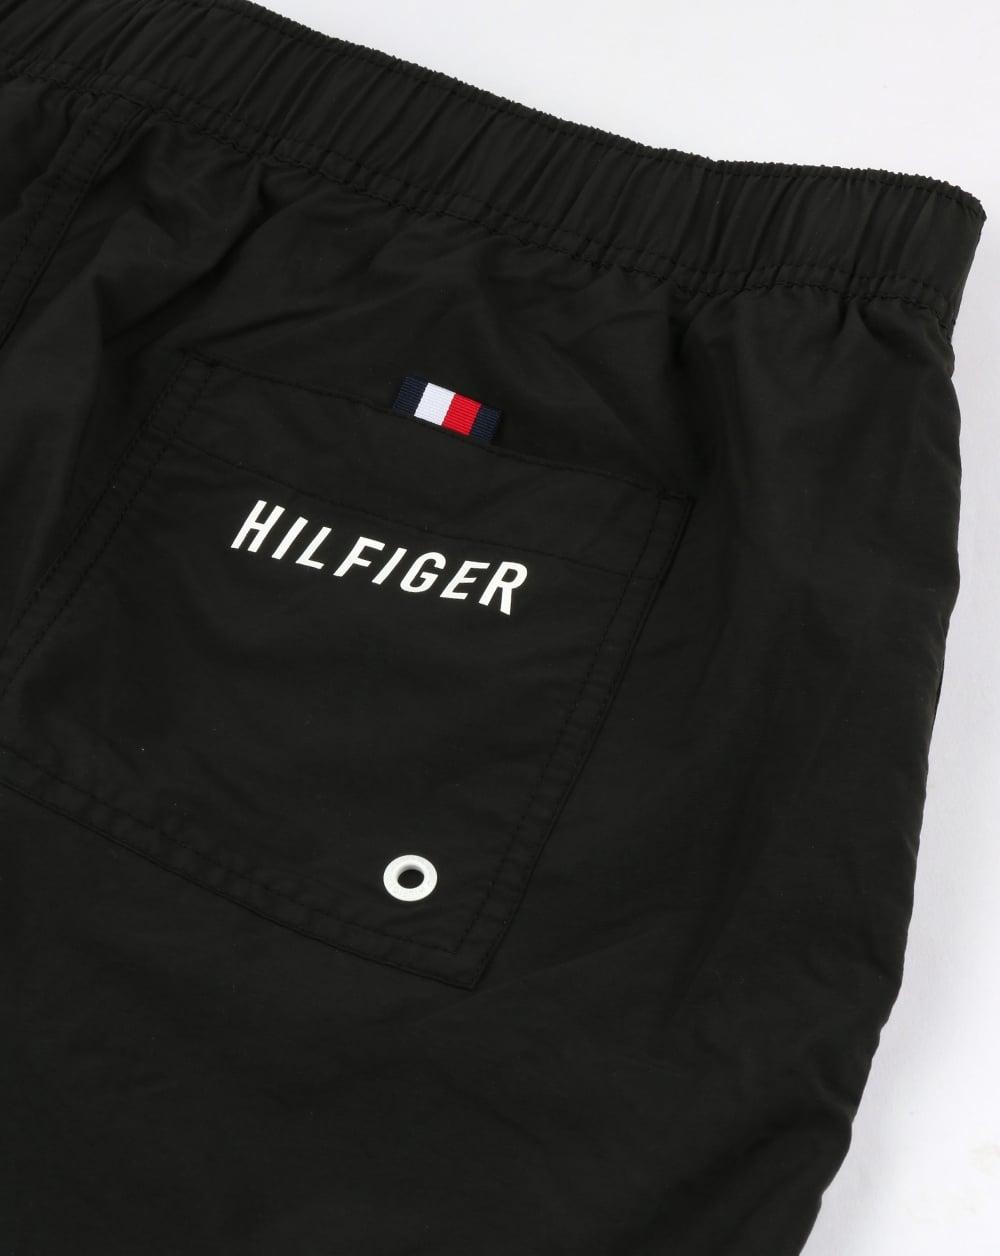 67592dc7 Tommy Hilfiger Flag Leg Swim Shorts Black,beach,swimmers,mens